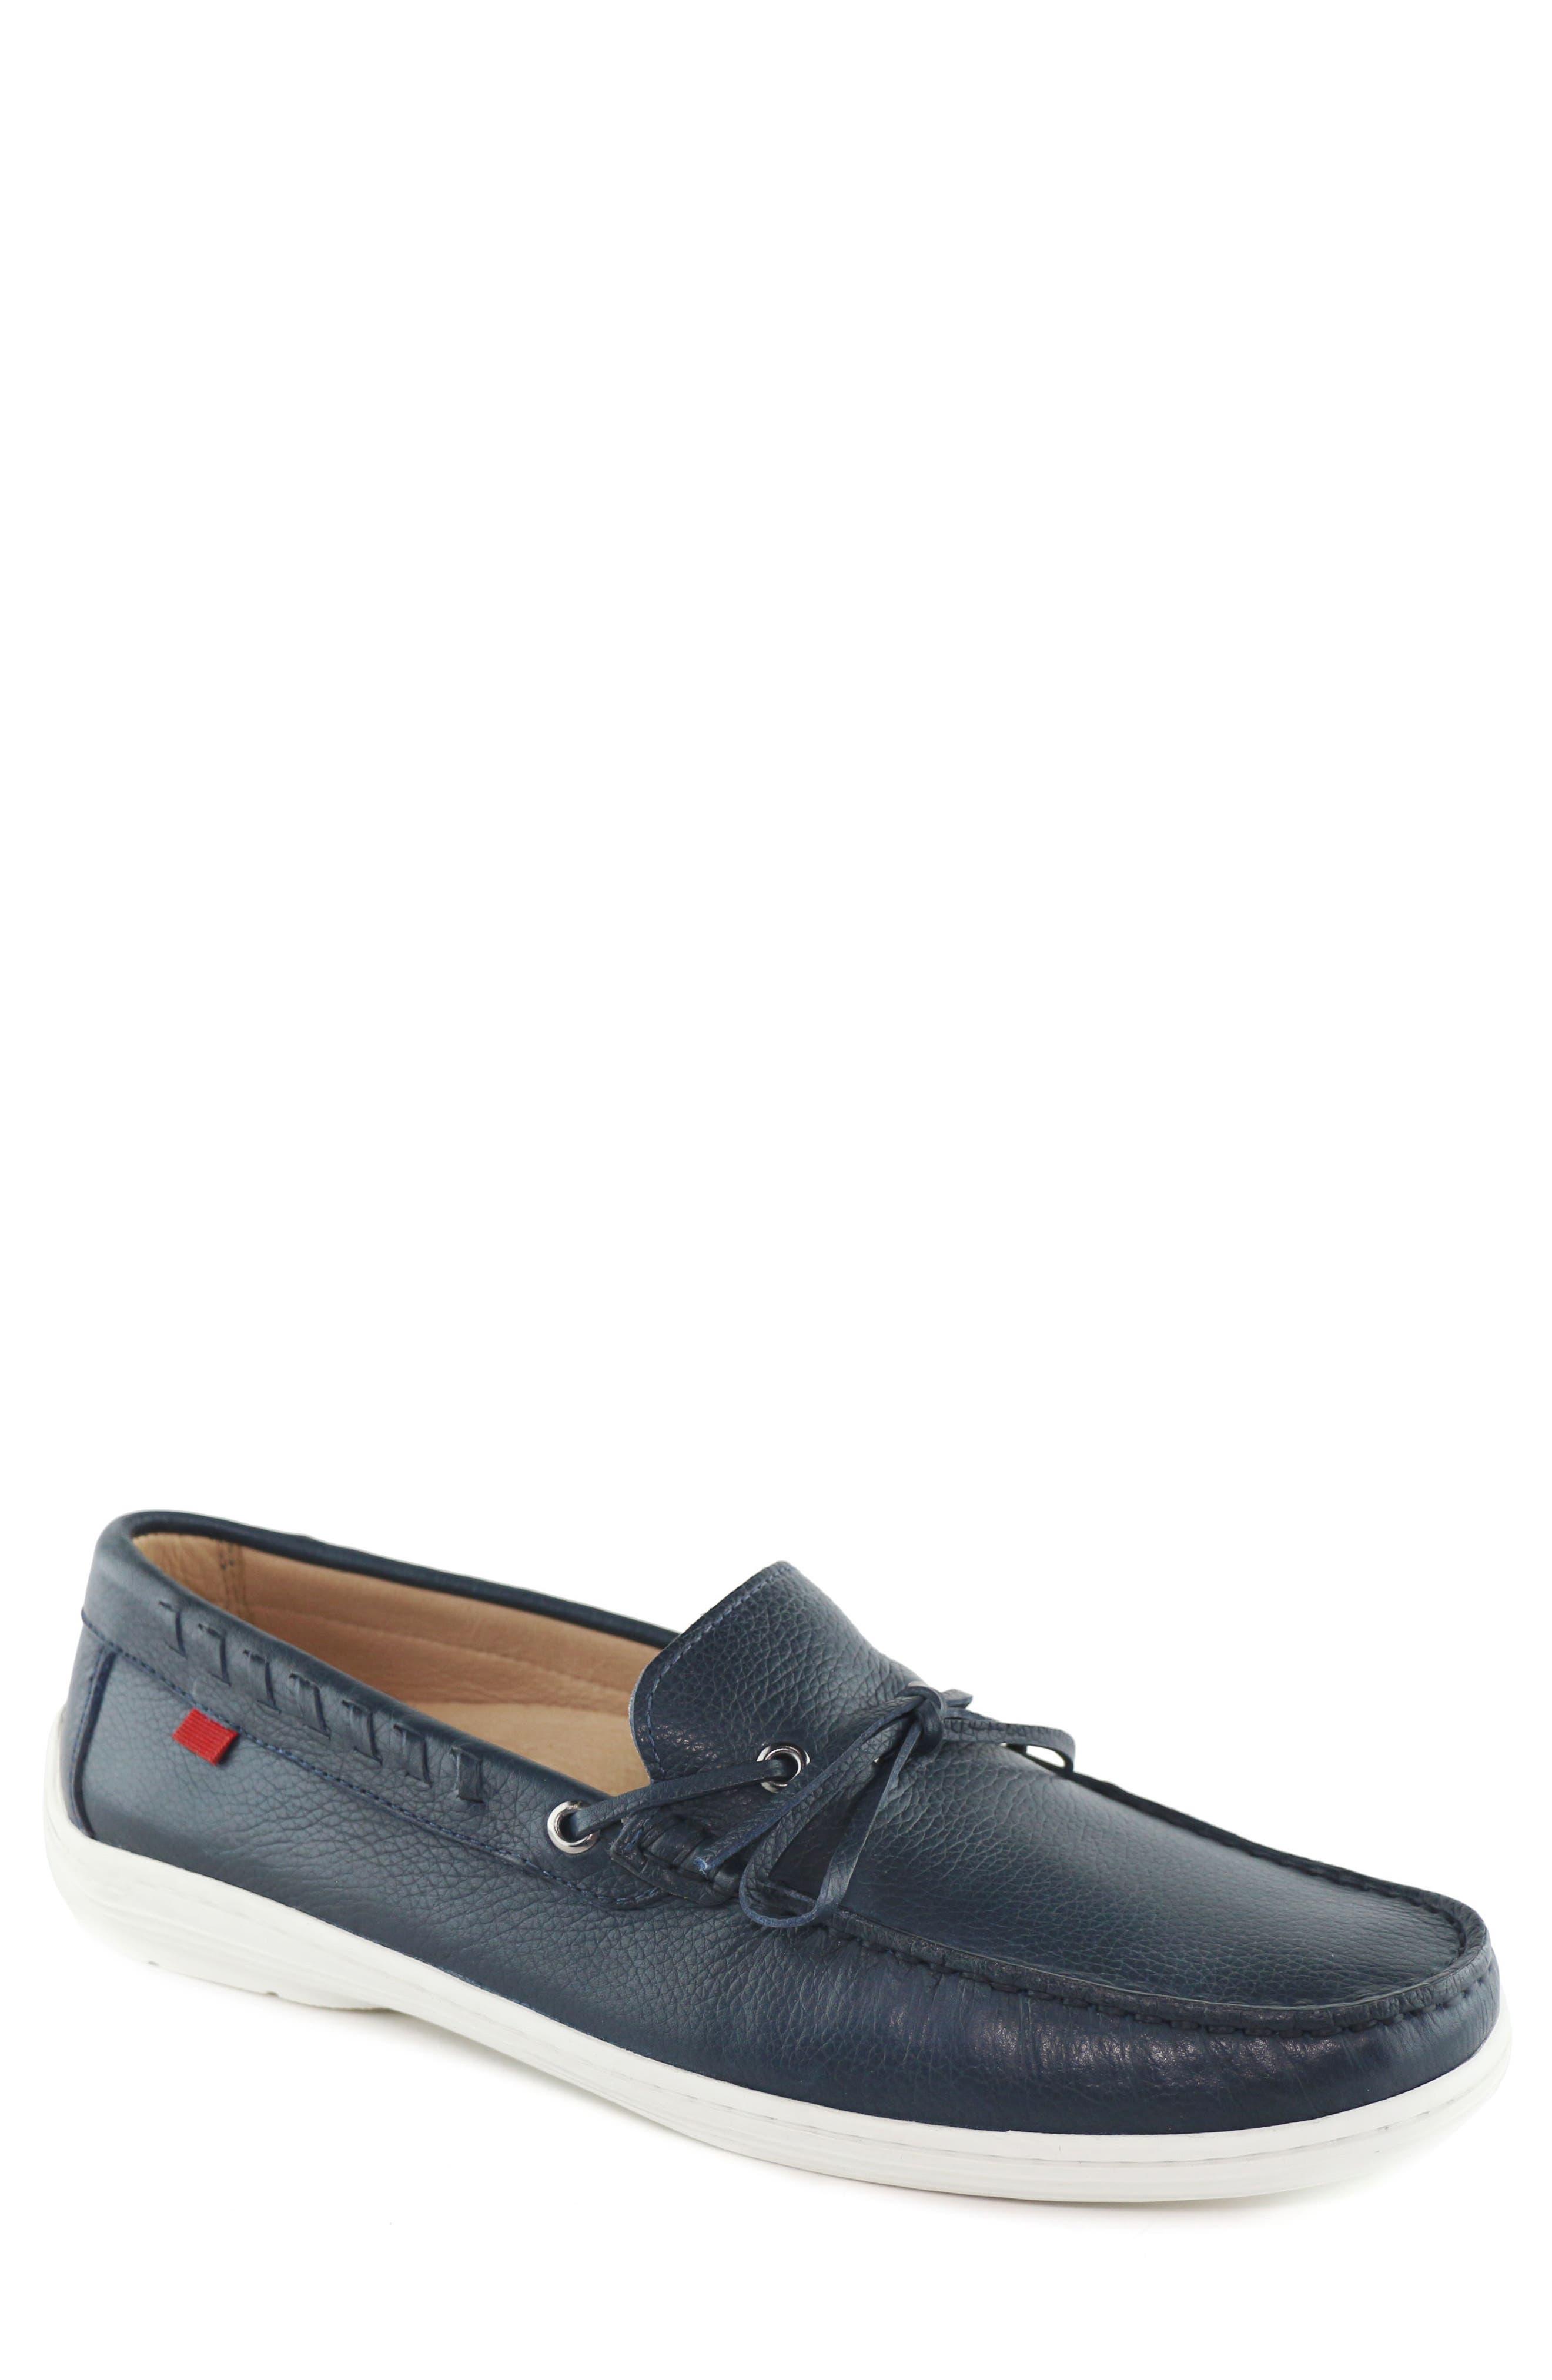 MARC JOSEPH NEW YORK Hudson Boat Shoe